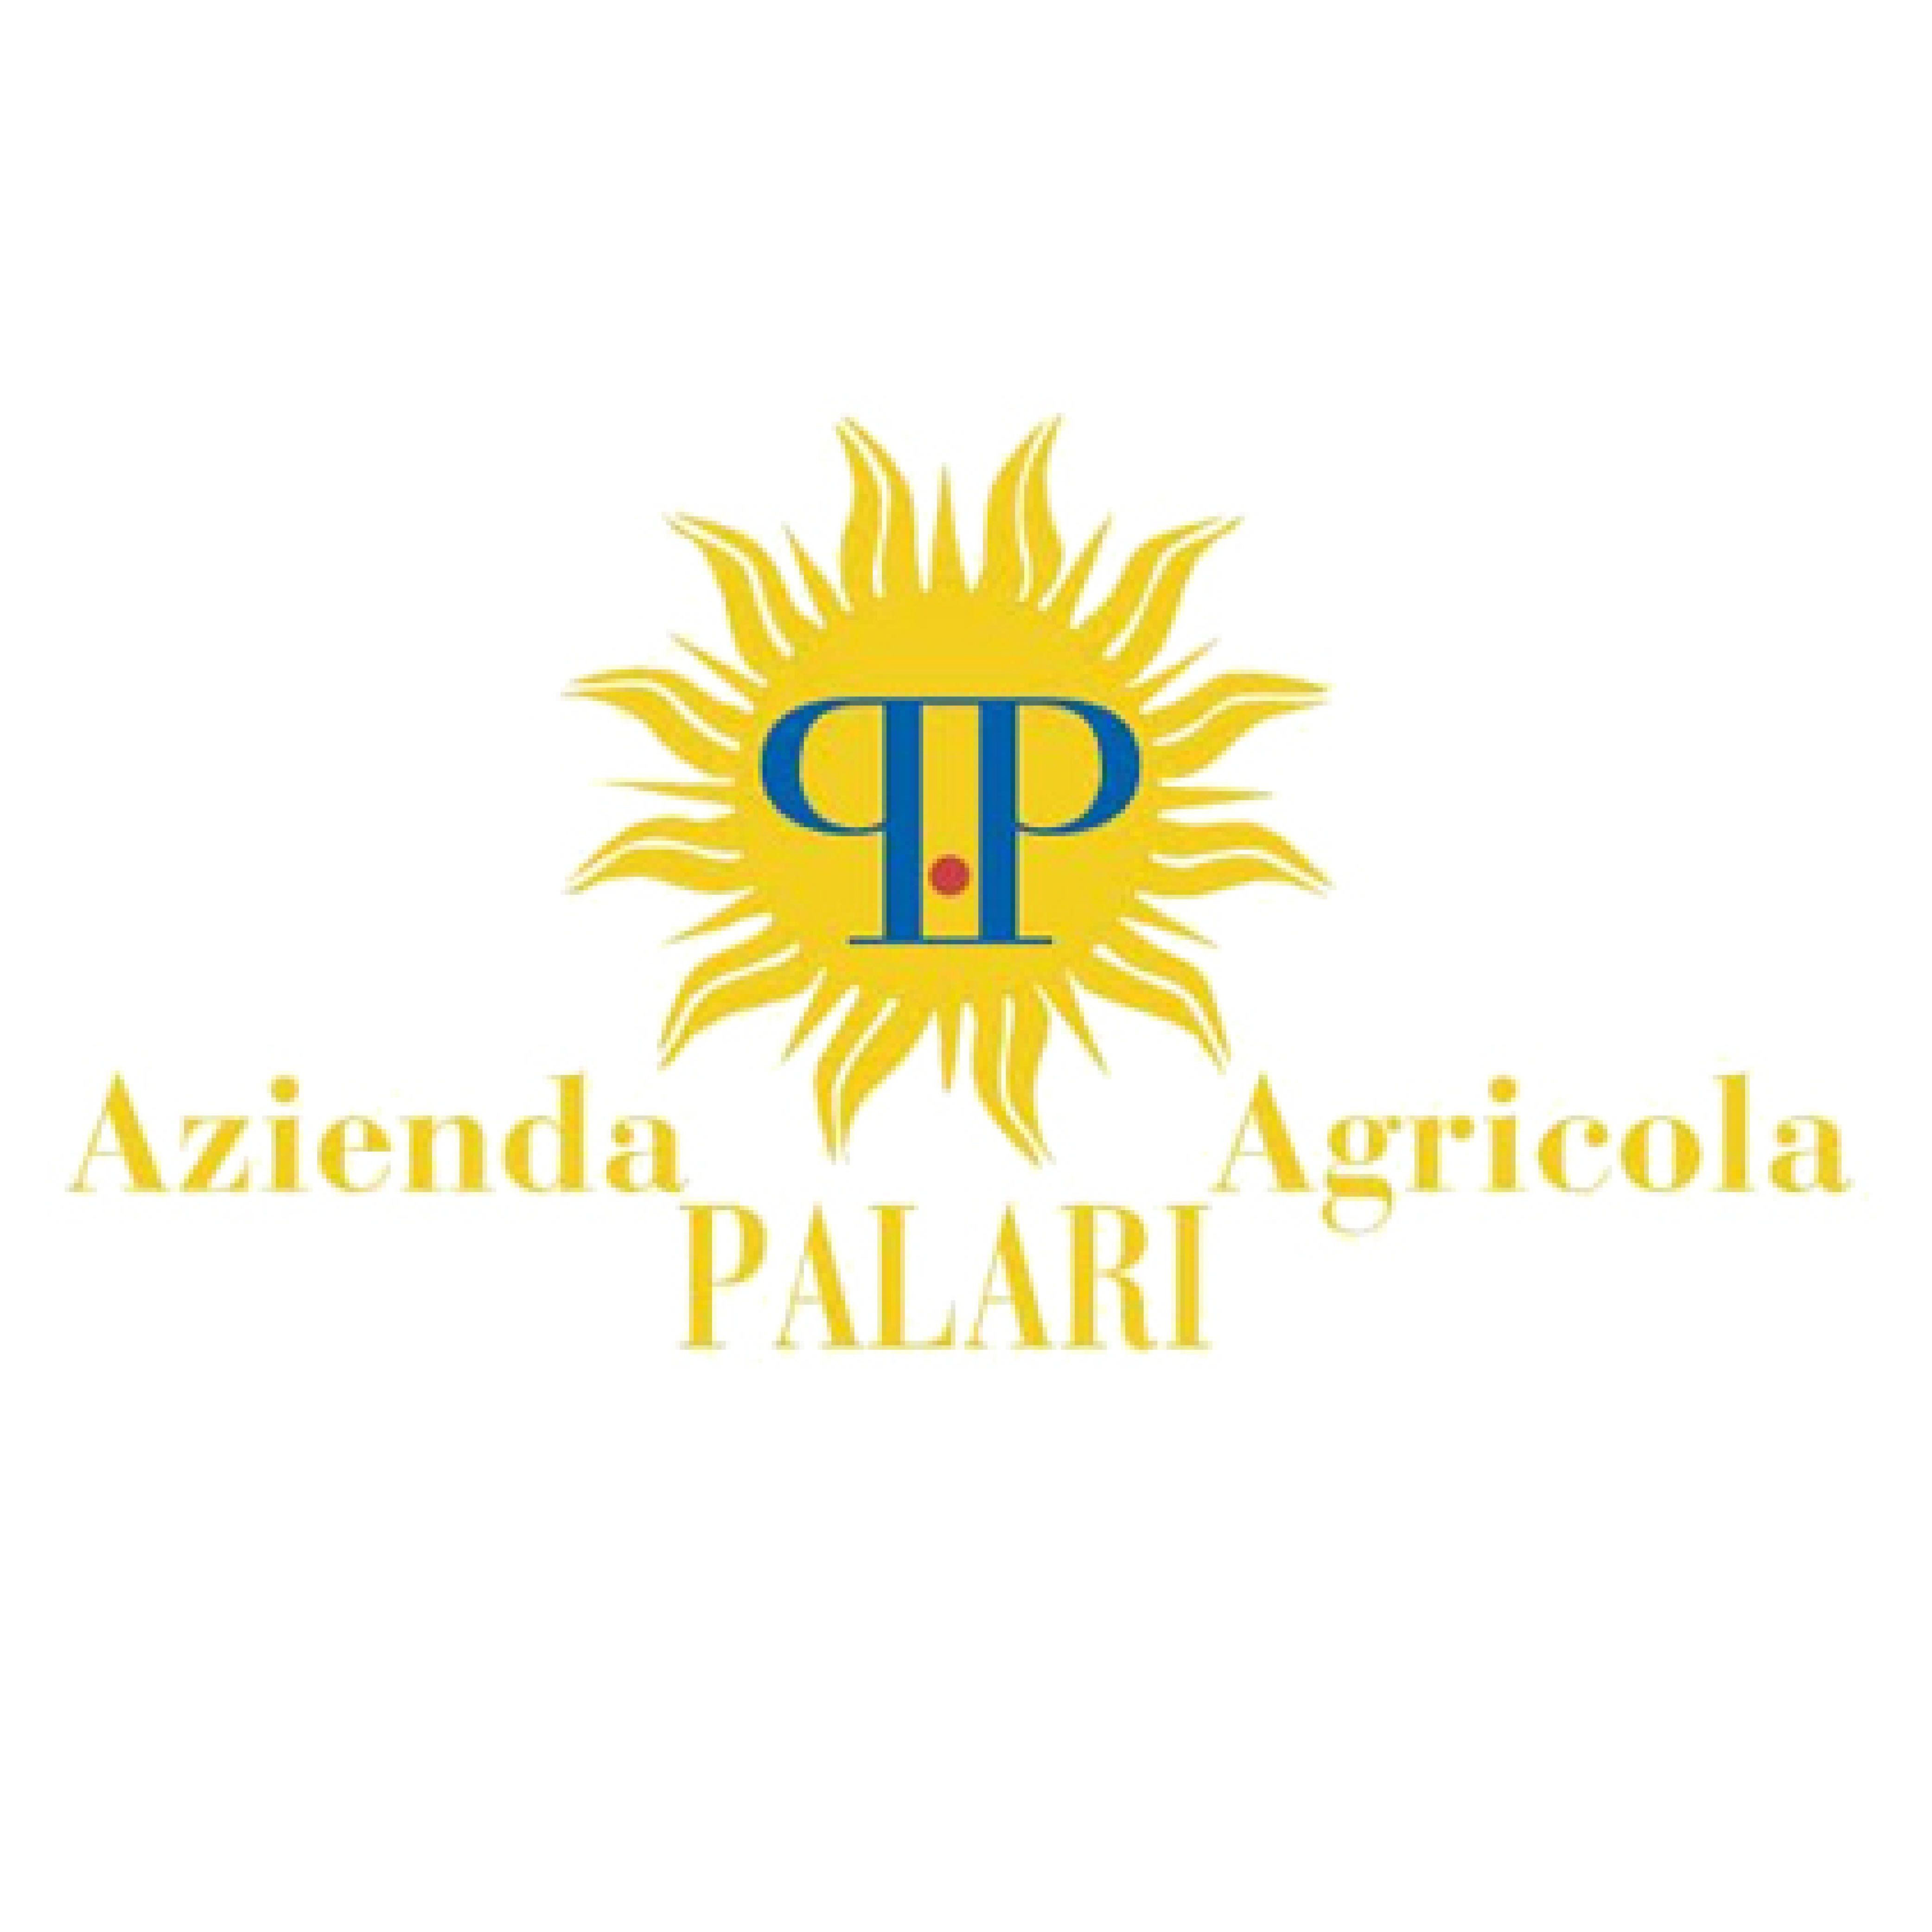 Azienda Palari a Vinòforum Class